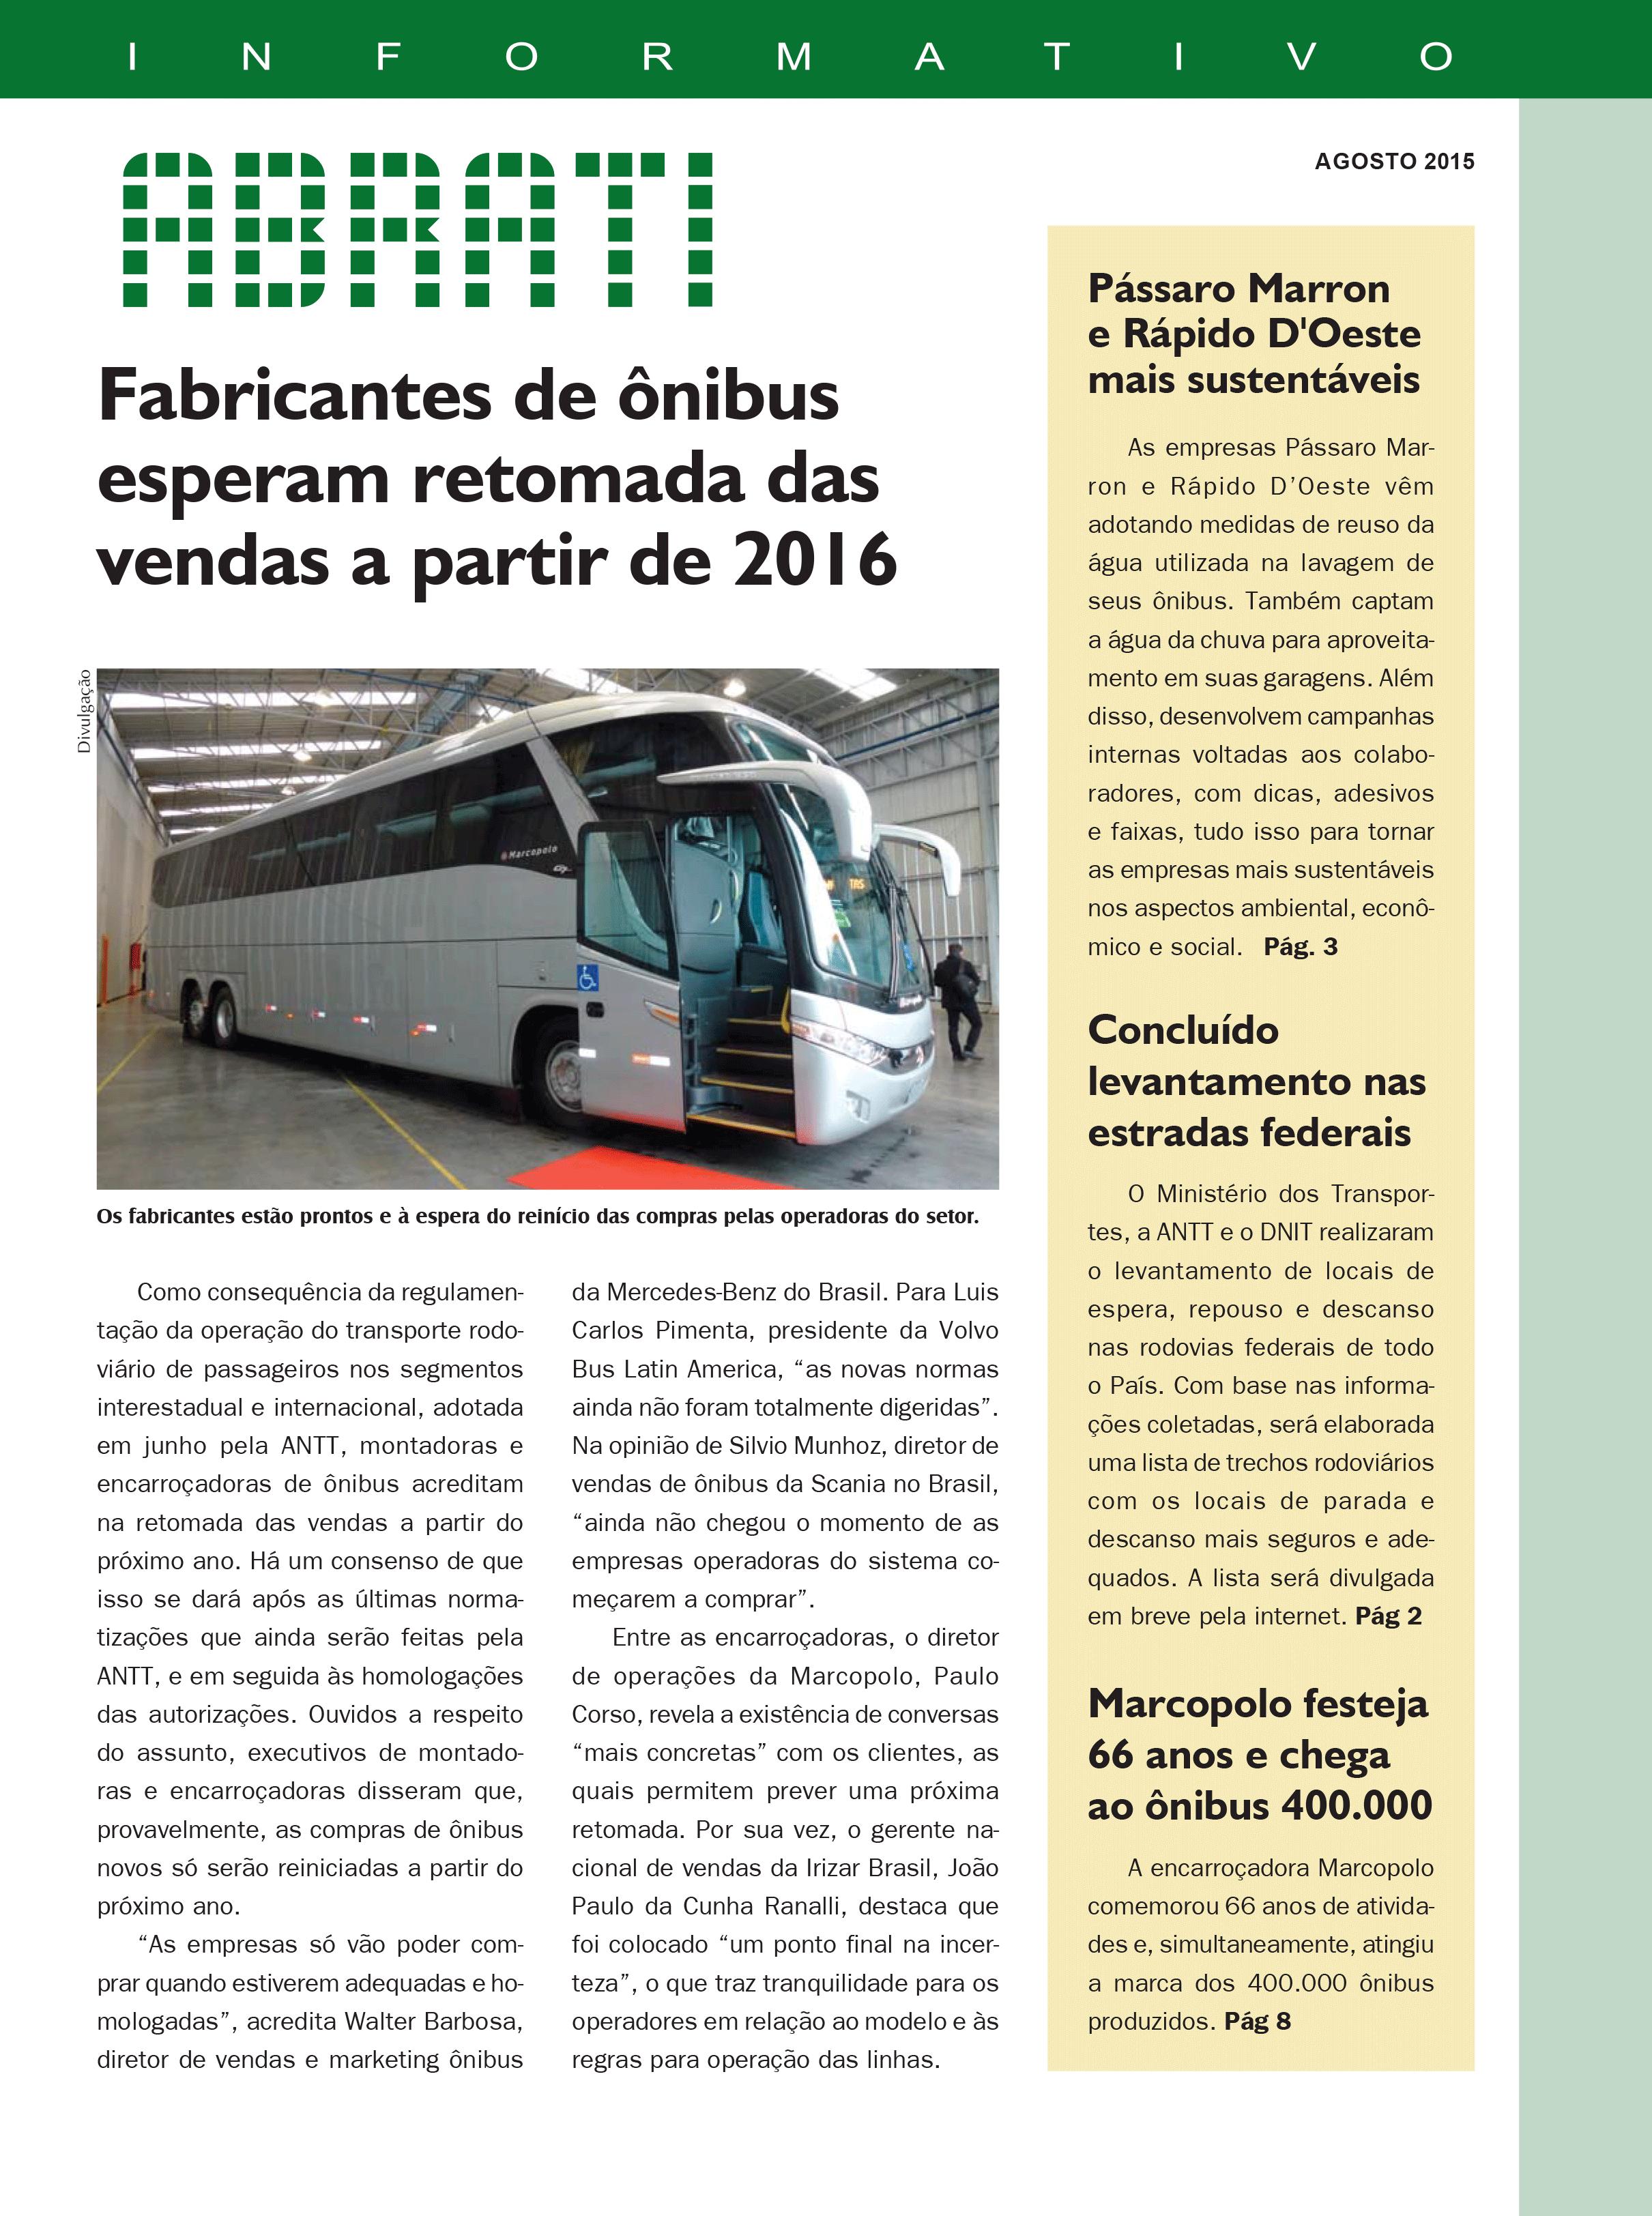 Informativo Agosto 2015